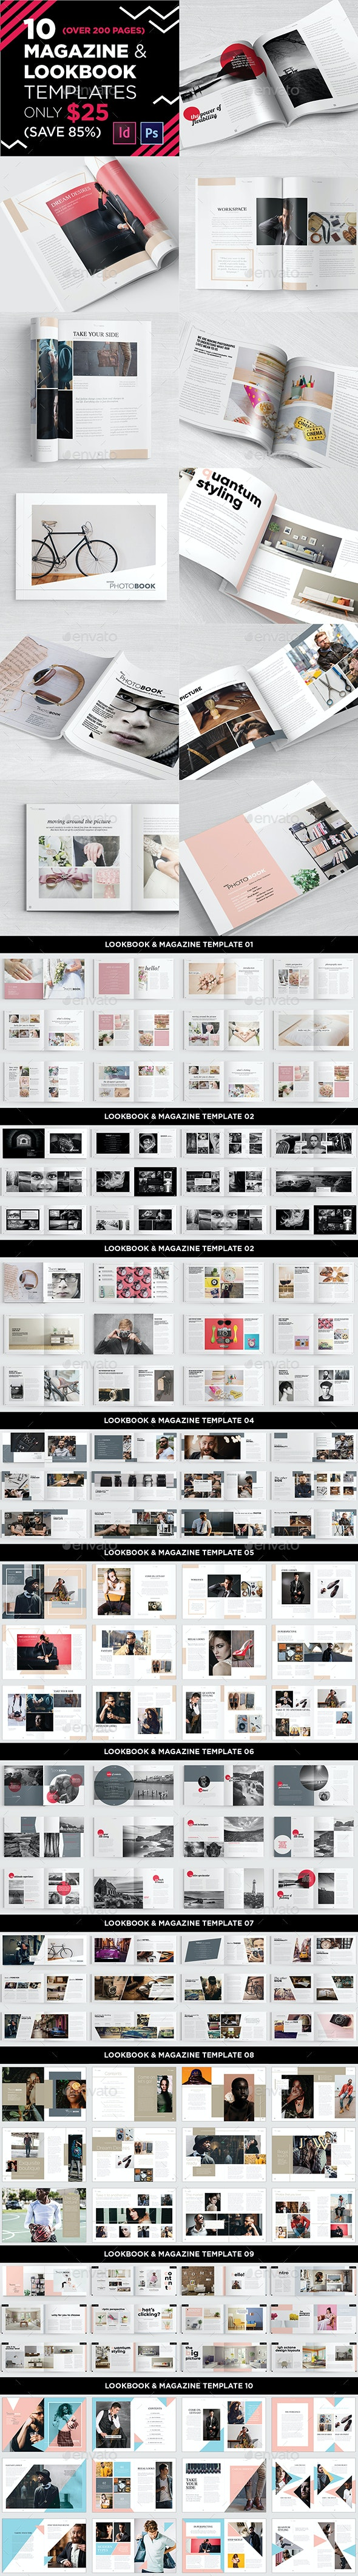 10 Magazine/Lookbook Template InDesign & Photoshop - Magazines Print Templates